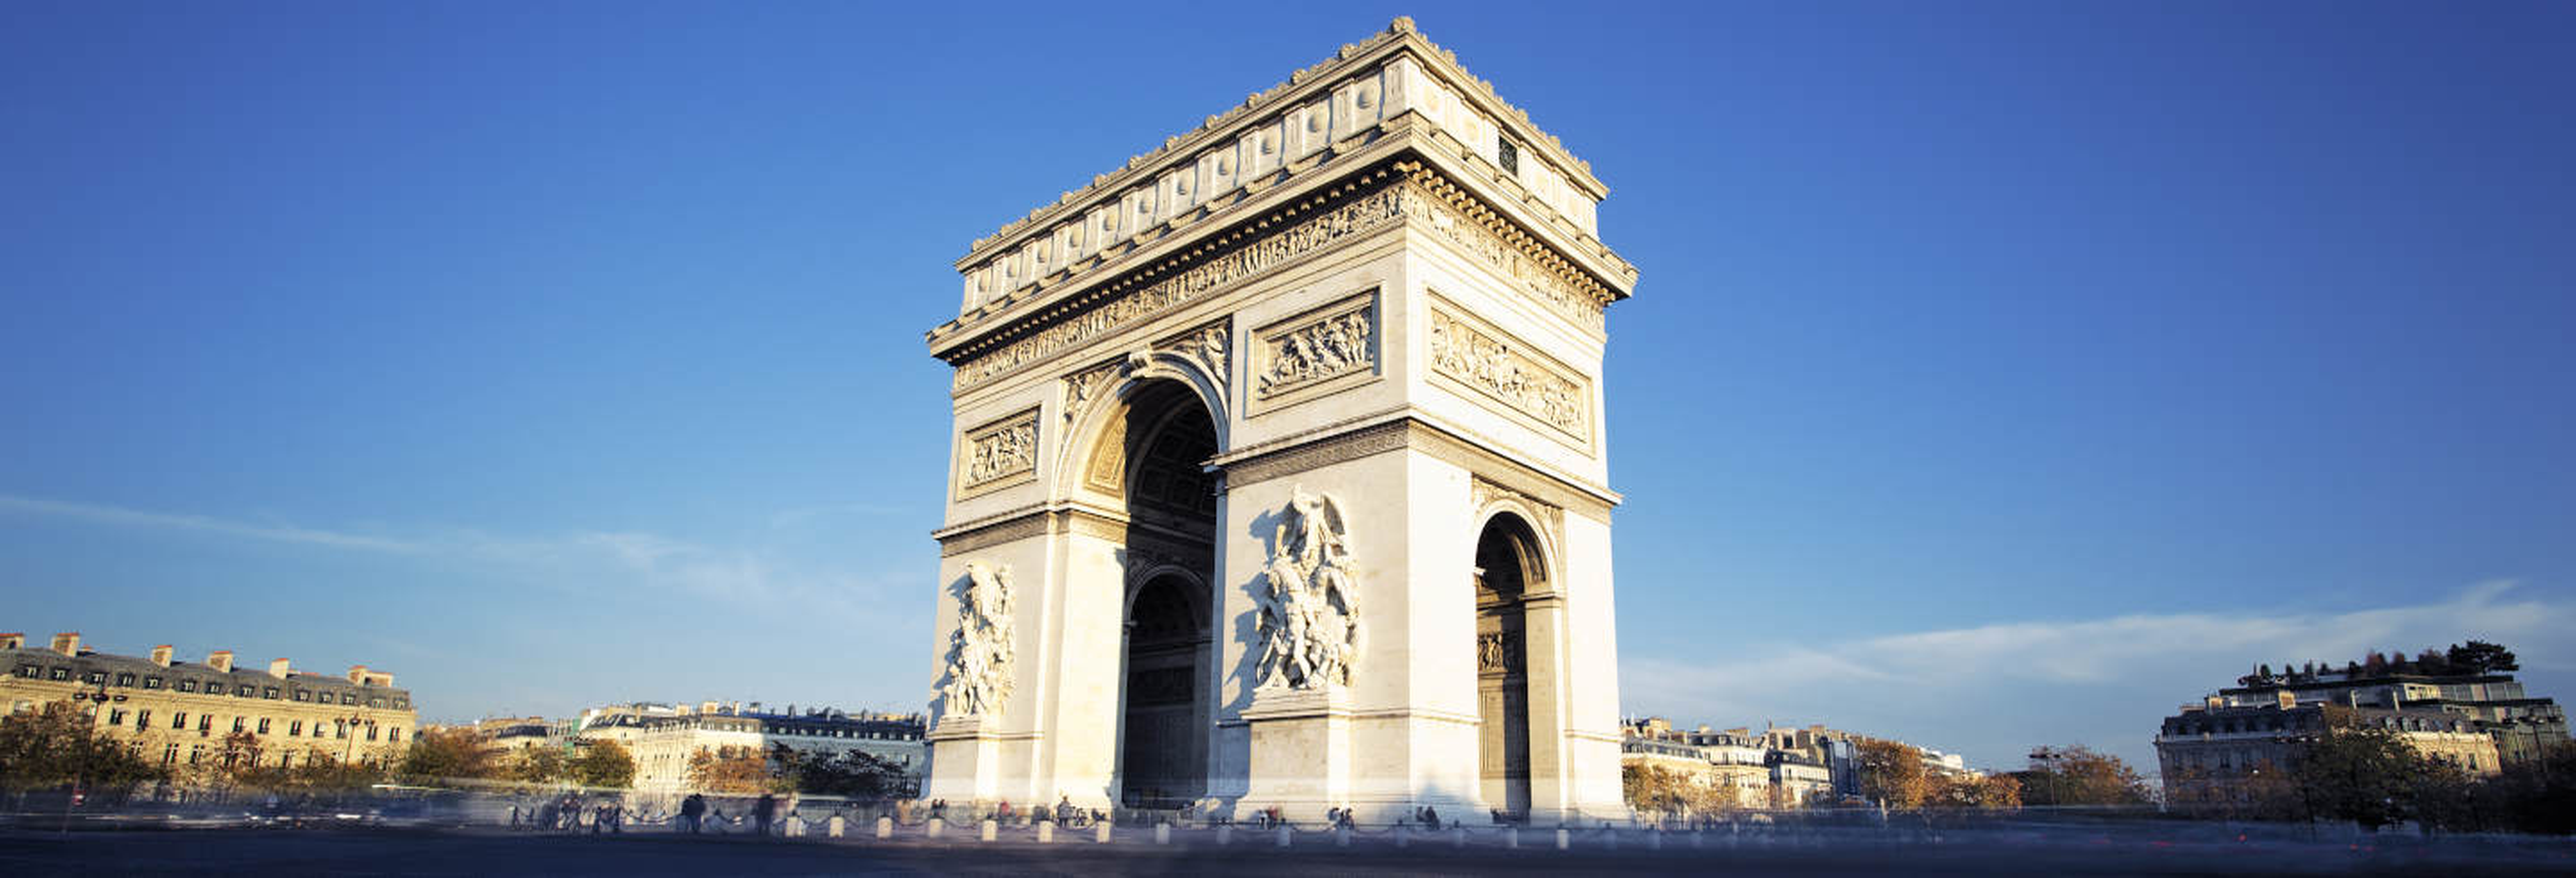 Arc de Triomphe Skip the Line Ticket